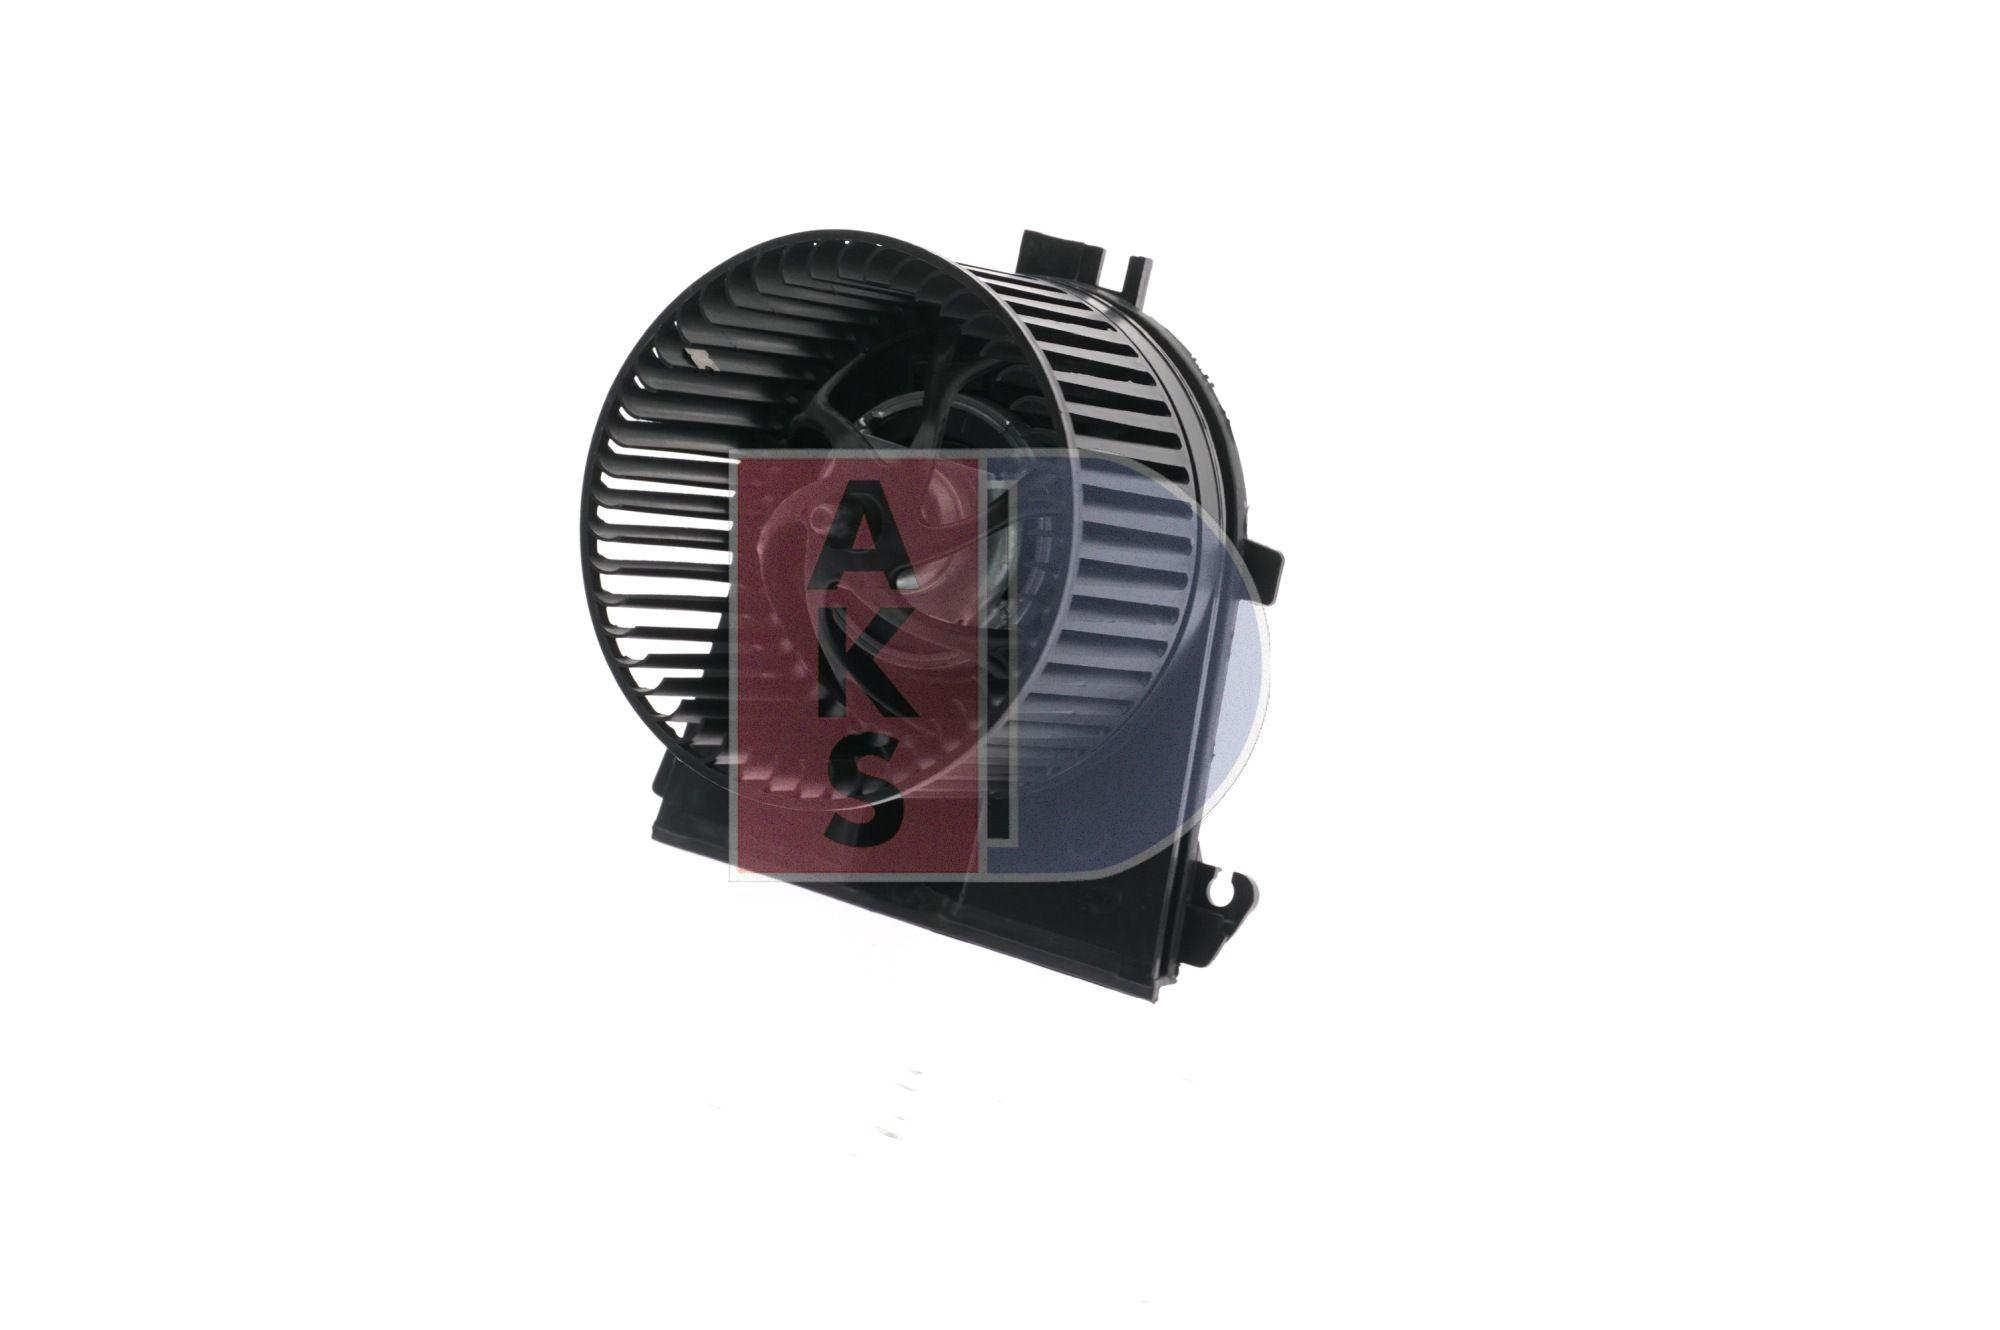 Lüftermotor AKS DASIS 740934N Erfahrung